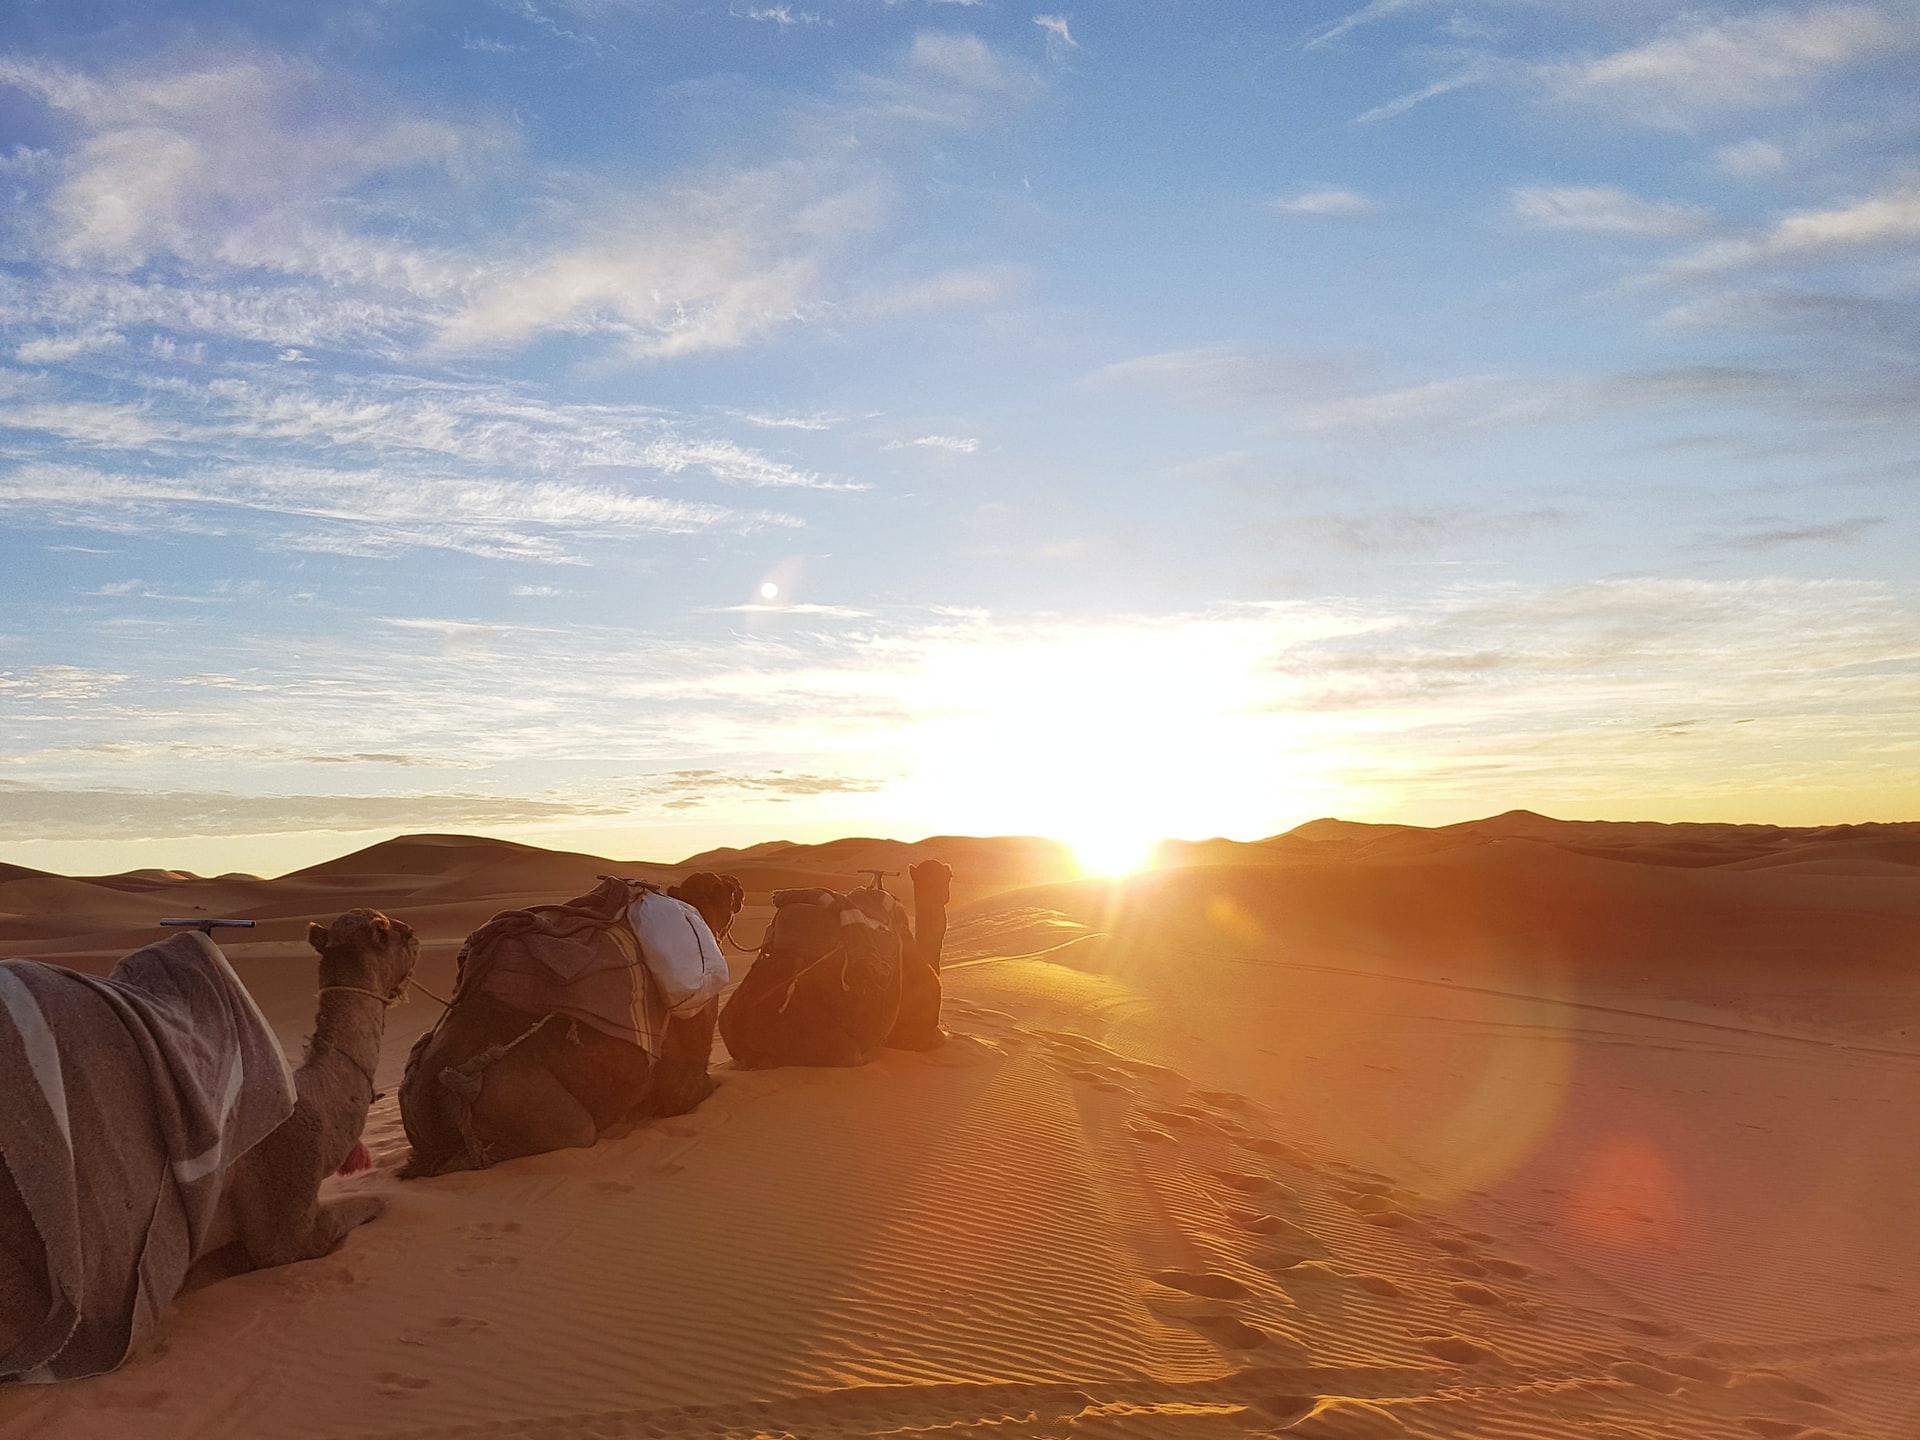 sunrise time from the dunes of erg chebbi at merzouga - sahara desert camping - sahara desert activities